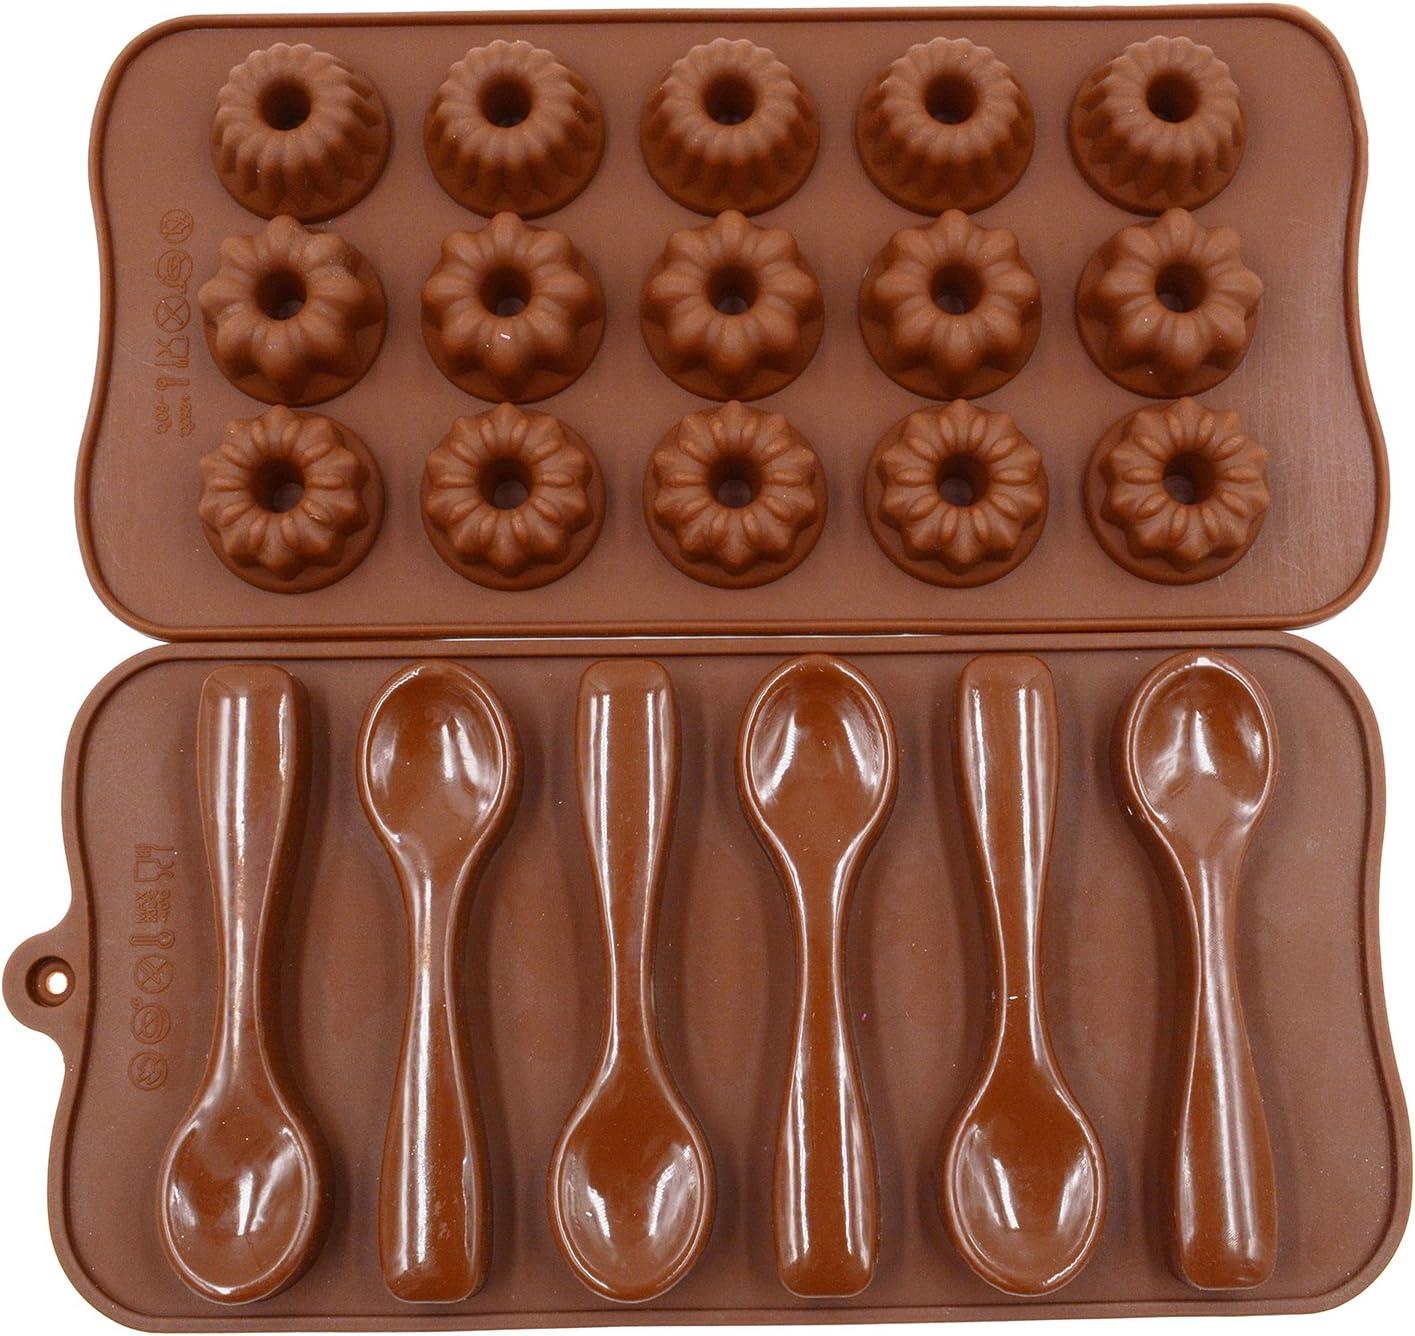 Spoon Silicone Mold-Cake Decoration Mold-Fondant Chocolate Mold-DIY Baking Mold-Food Grade Mold-Spoon Mould-Craft Supplies Mold